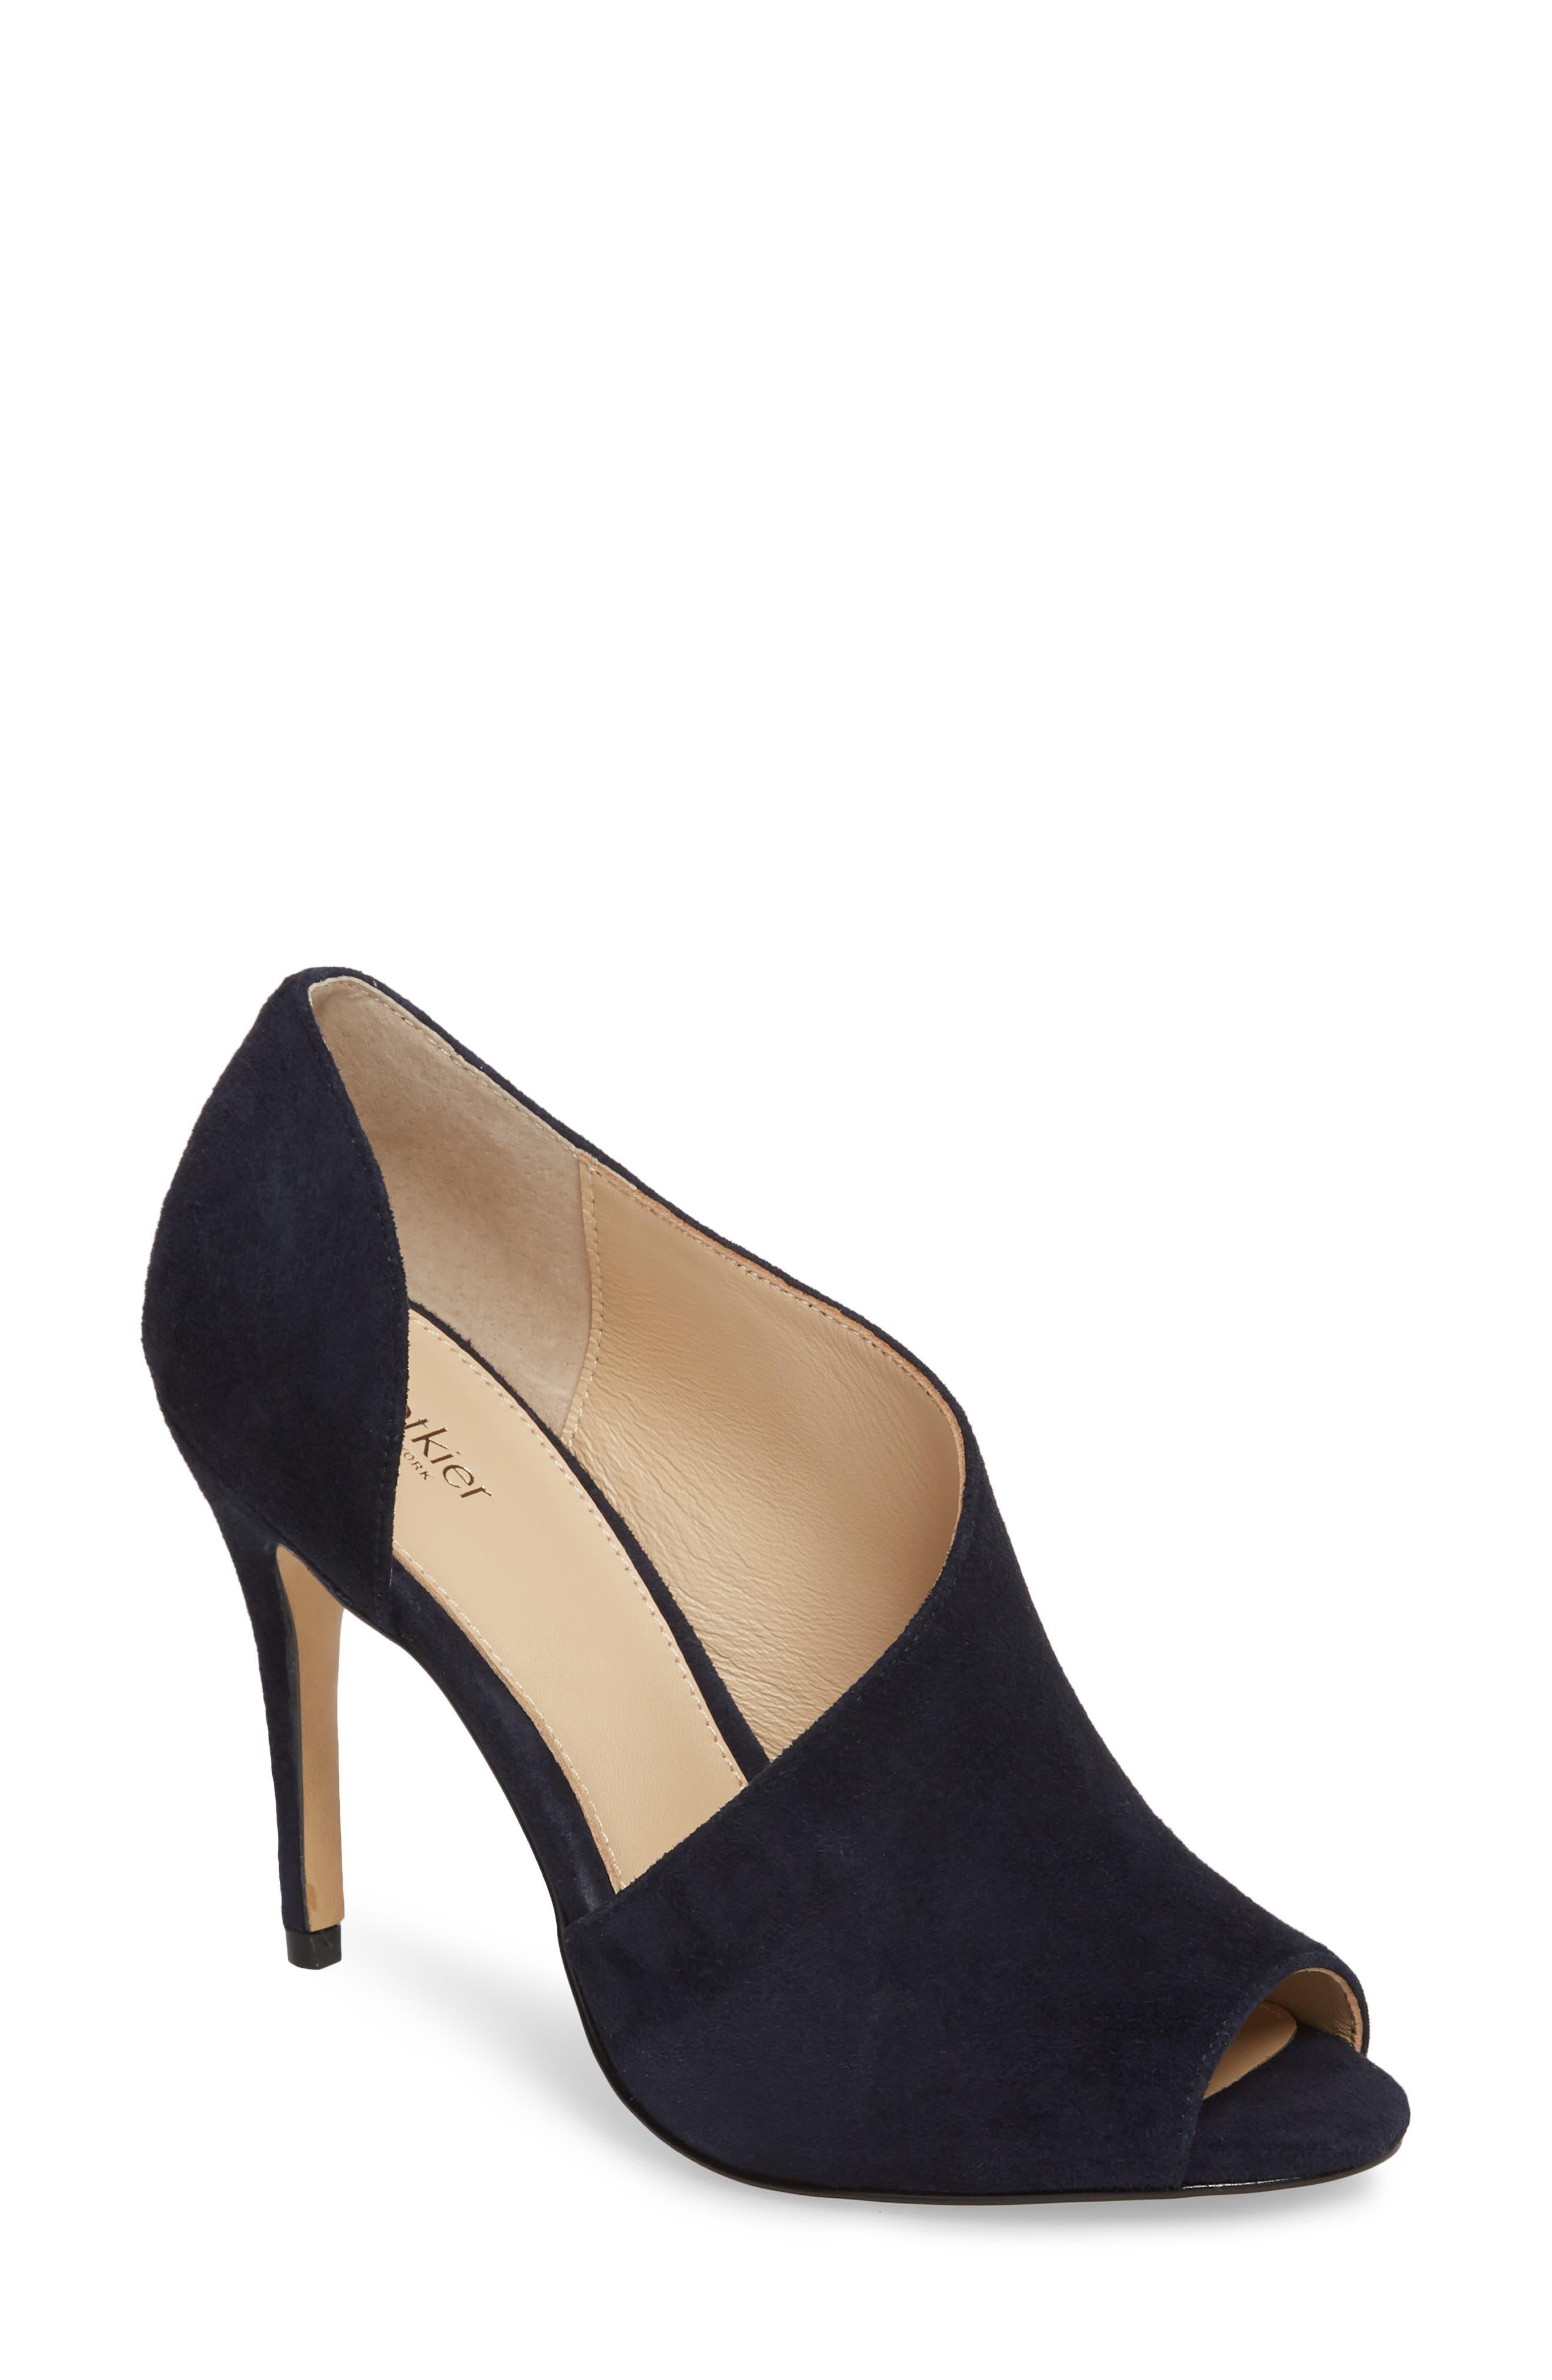 Adelia Asymmetrical Sandal,                             Main thumbnail 1, color,                             Navy Suede